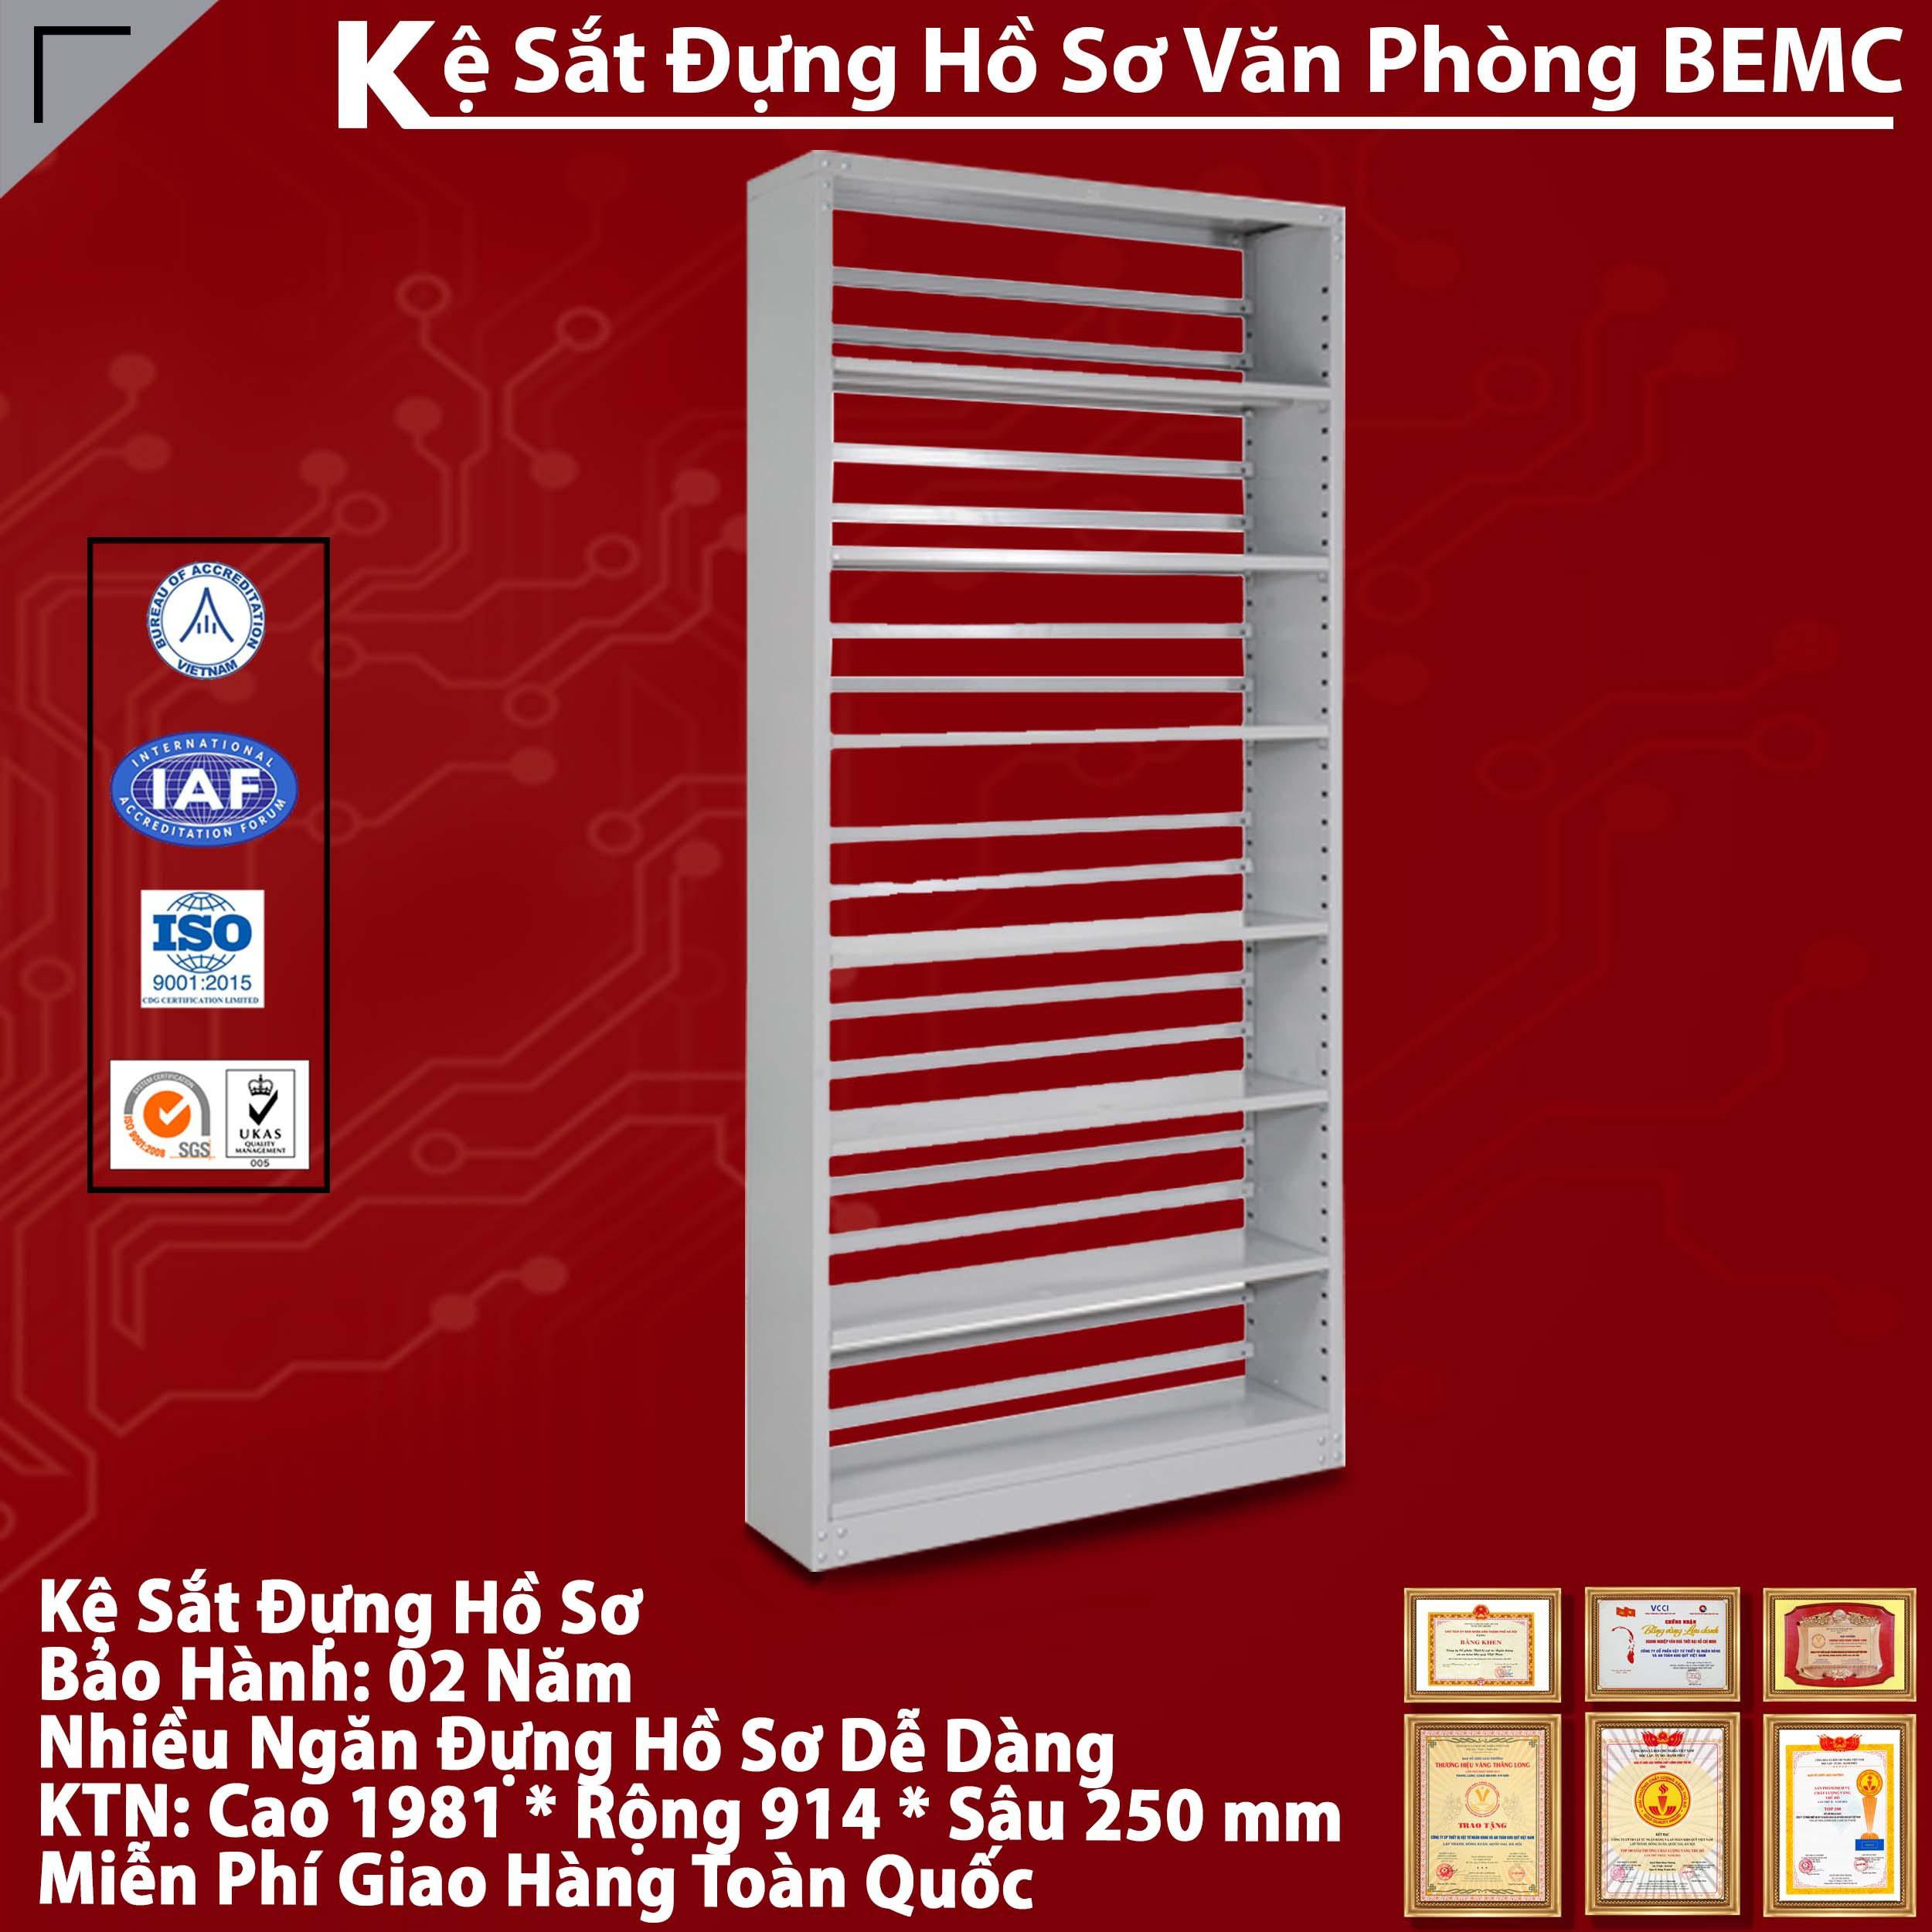 Giá BEMC-GS4B - Giá sắt đa năng - Giá sắt